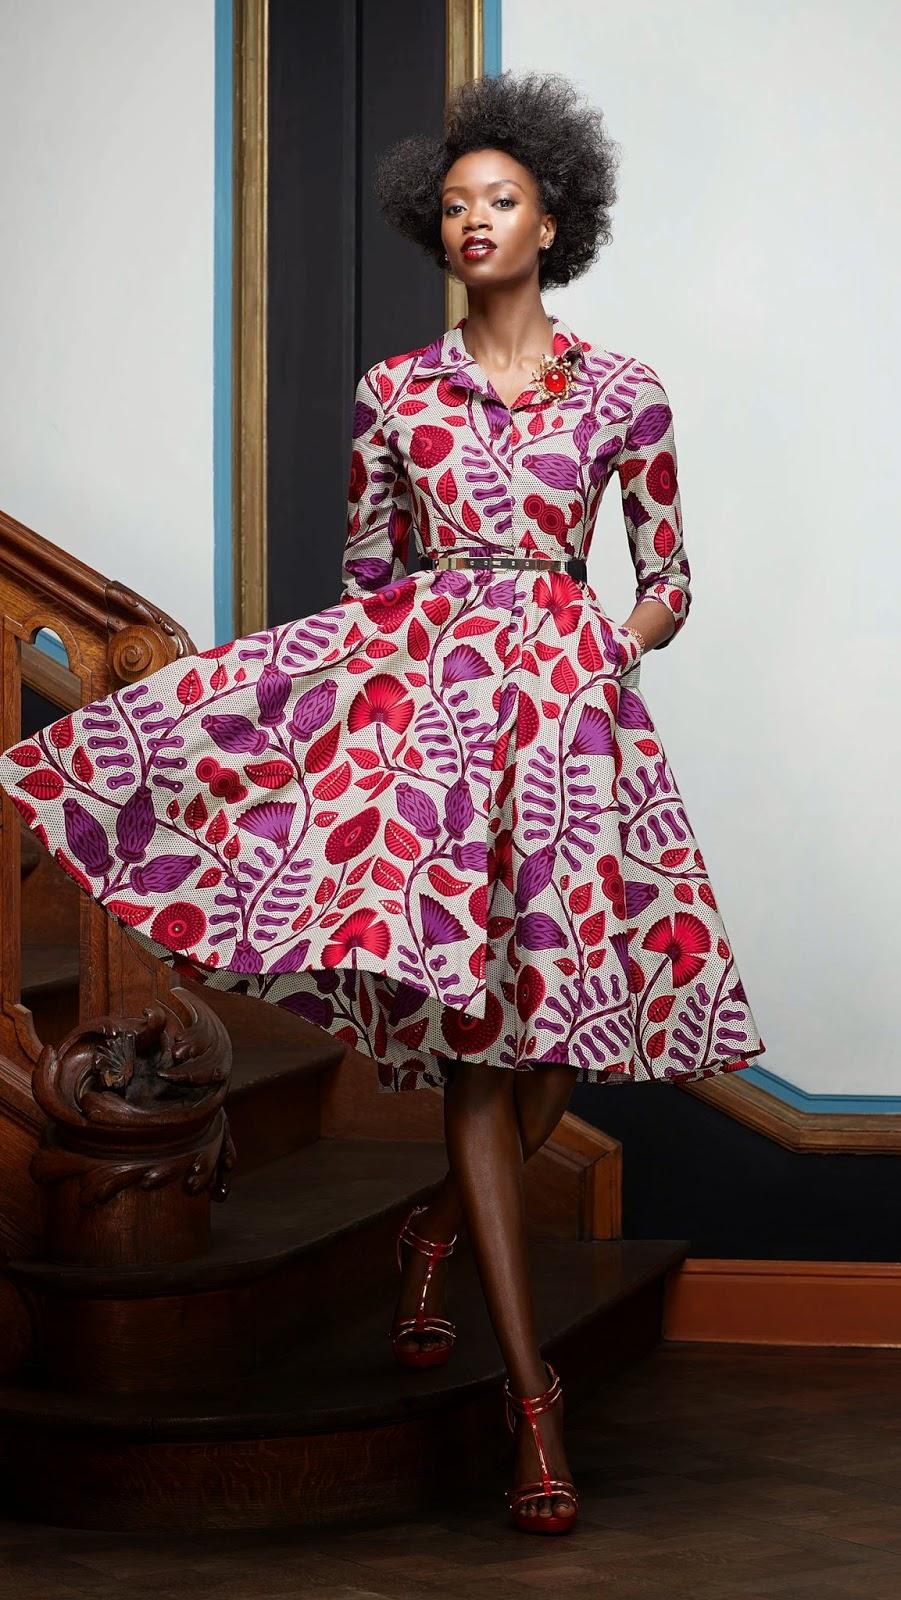 Lace Lovers Follow This Thread - Fashion - Nigeria